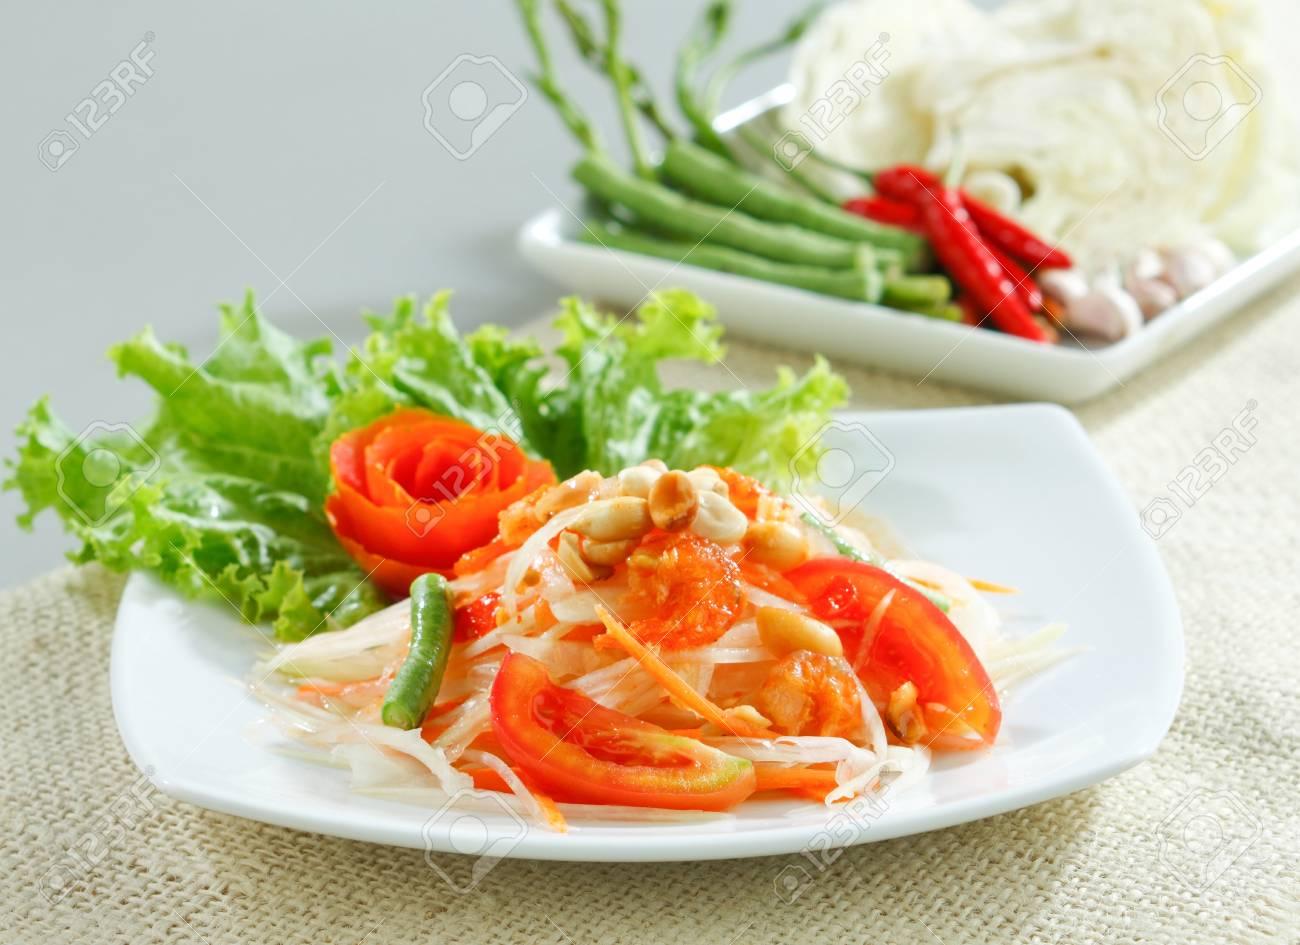 Thai papaya salad a tasty of Thai food menu Stock Photo - 17584741